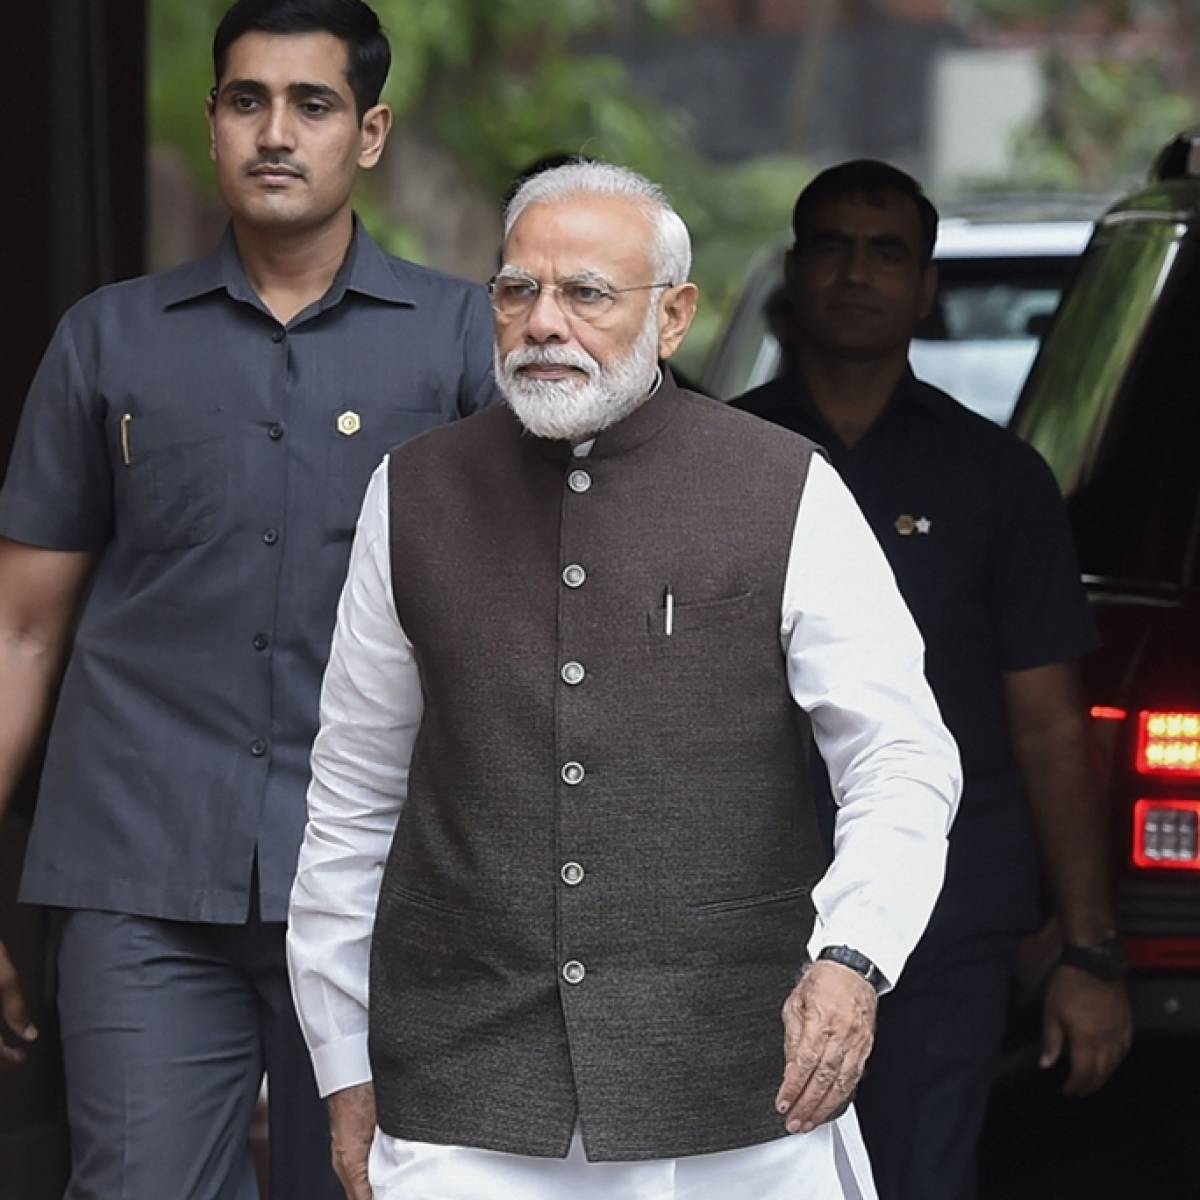 Loot & corruption reined in: PM Modi